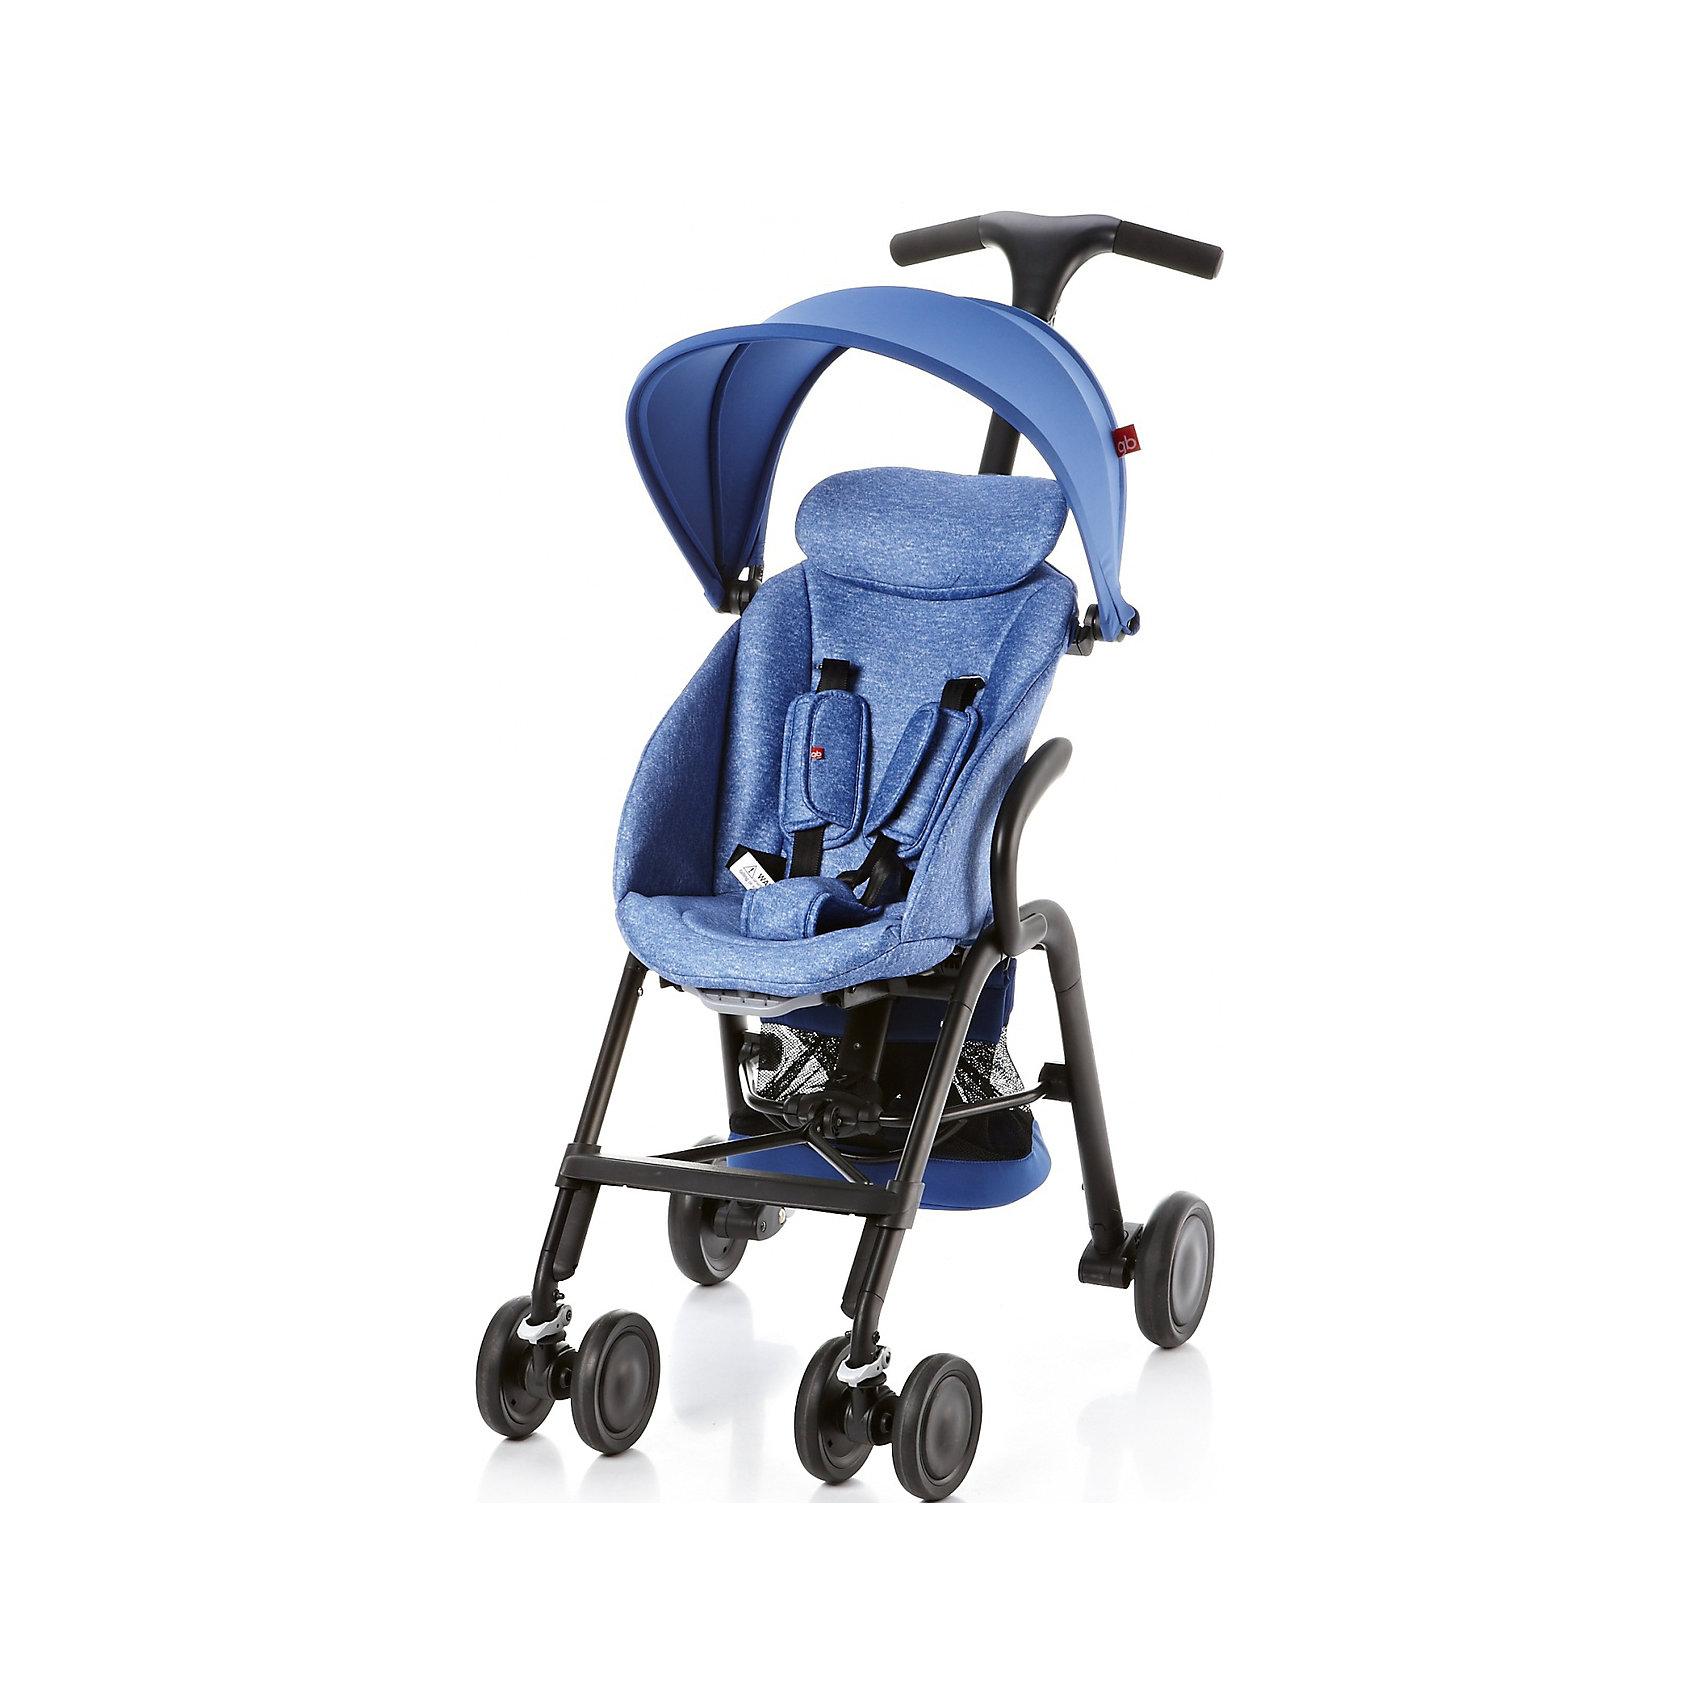 GB Коляска прогулочная T-BAR D330J, GB, синий коляска gb коляска прогулочная pockit dragonfire red